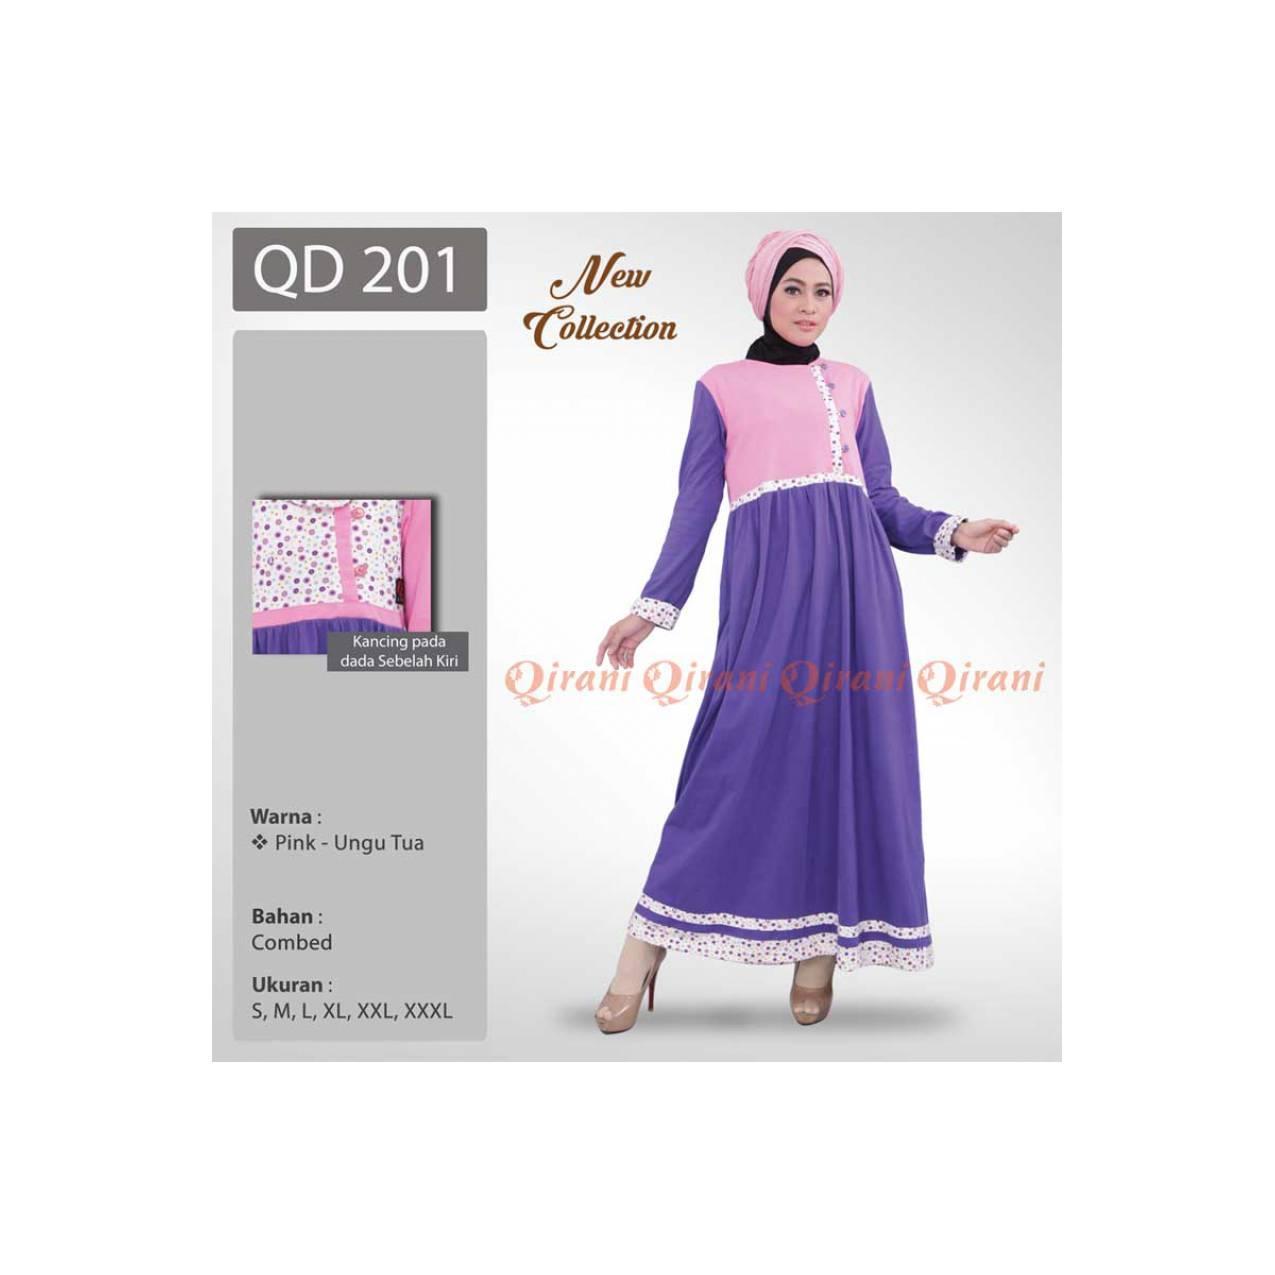 Baju Muslimah Gamis Murah Bahan Kaos QIRANI QD - 201